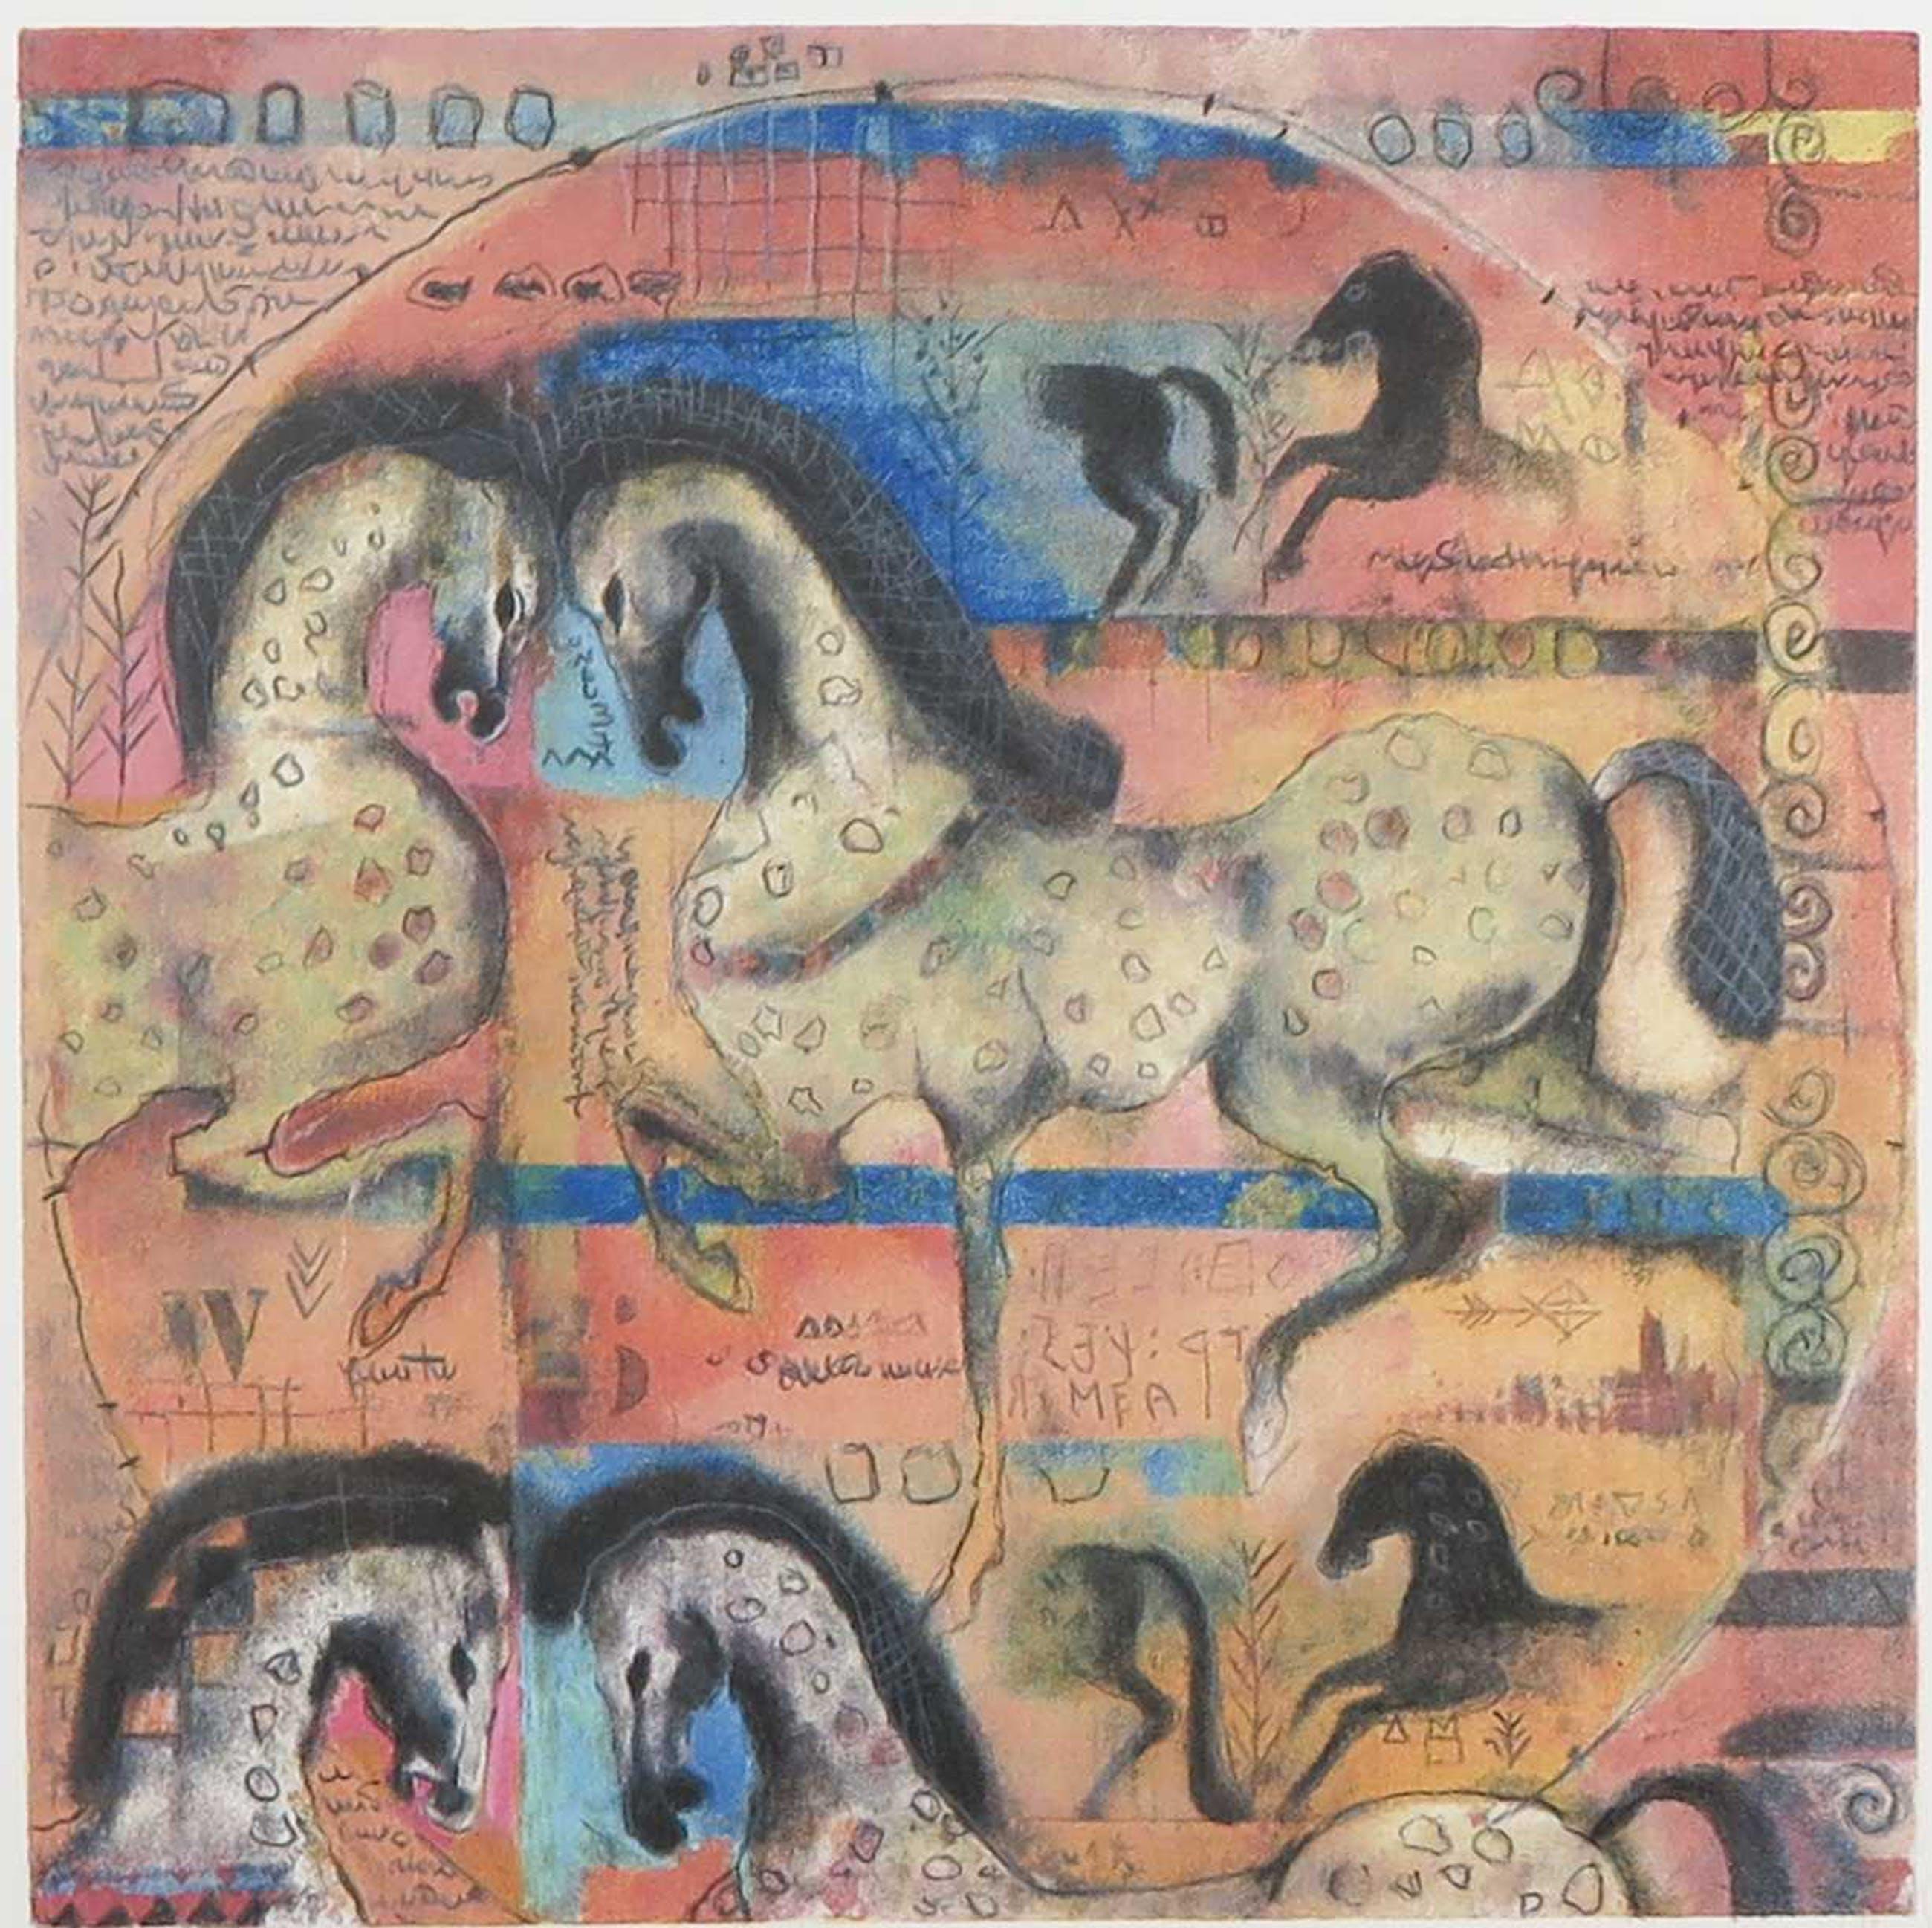 Astrid Engels - Litho, Etrurian War Horses - Ingelijst kopen? Bied vanaf 50!